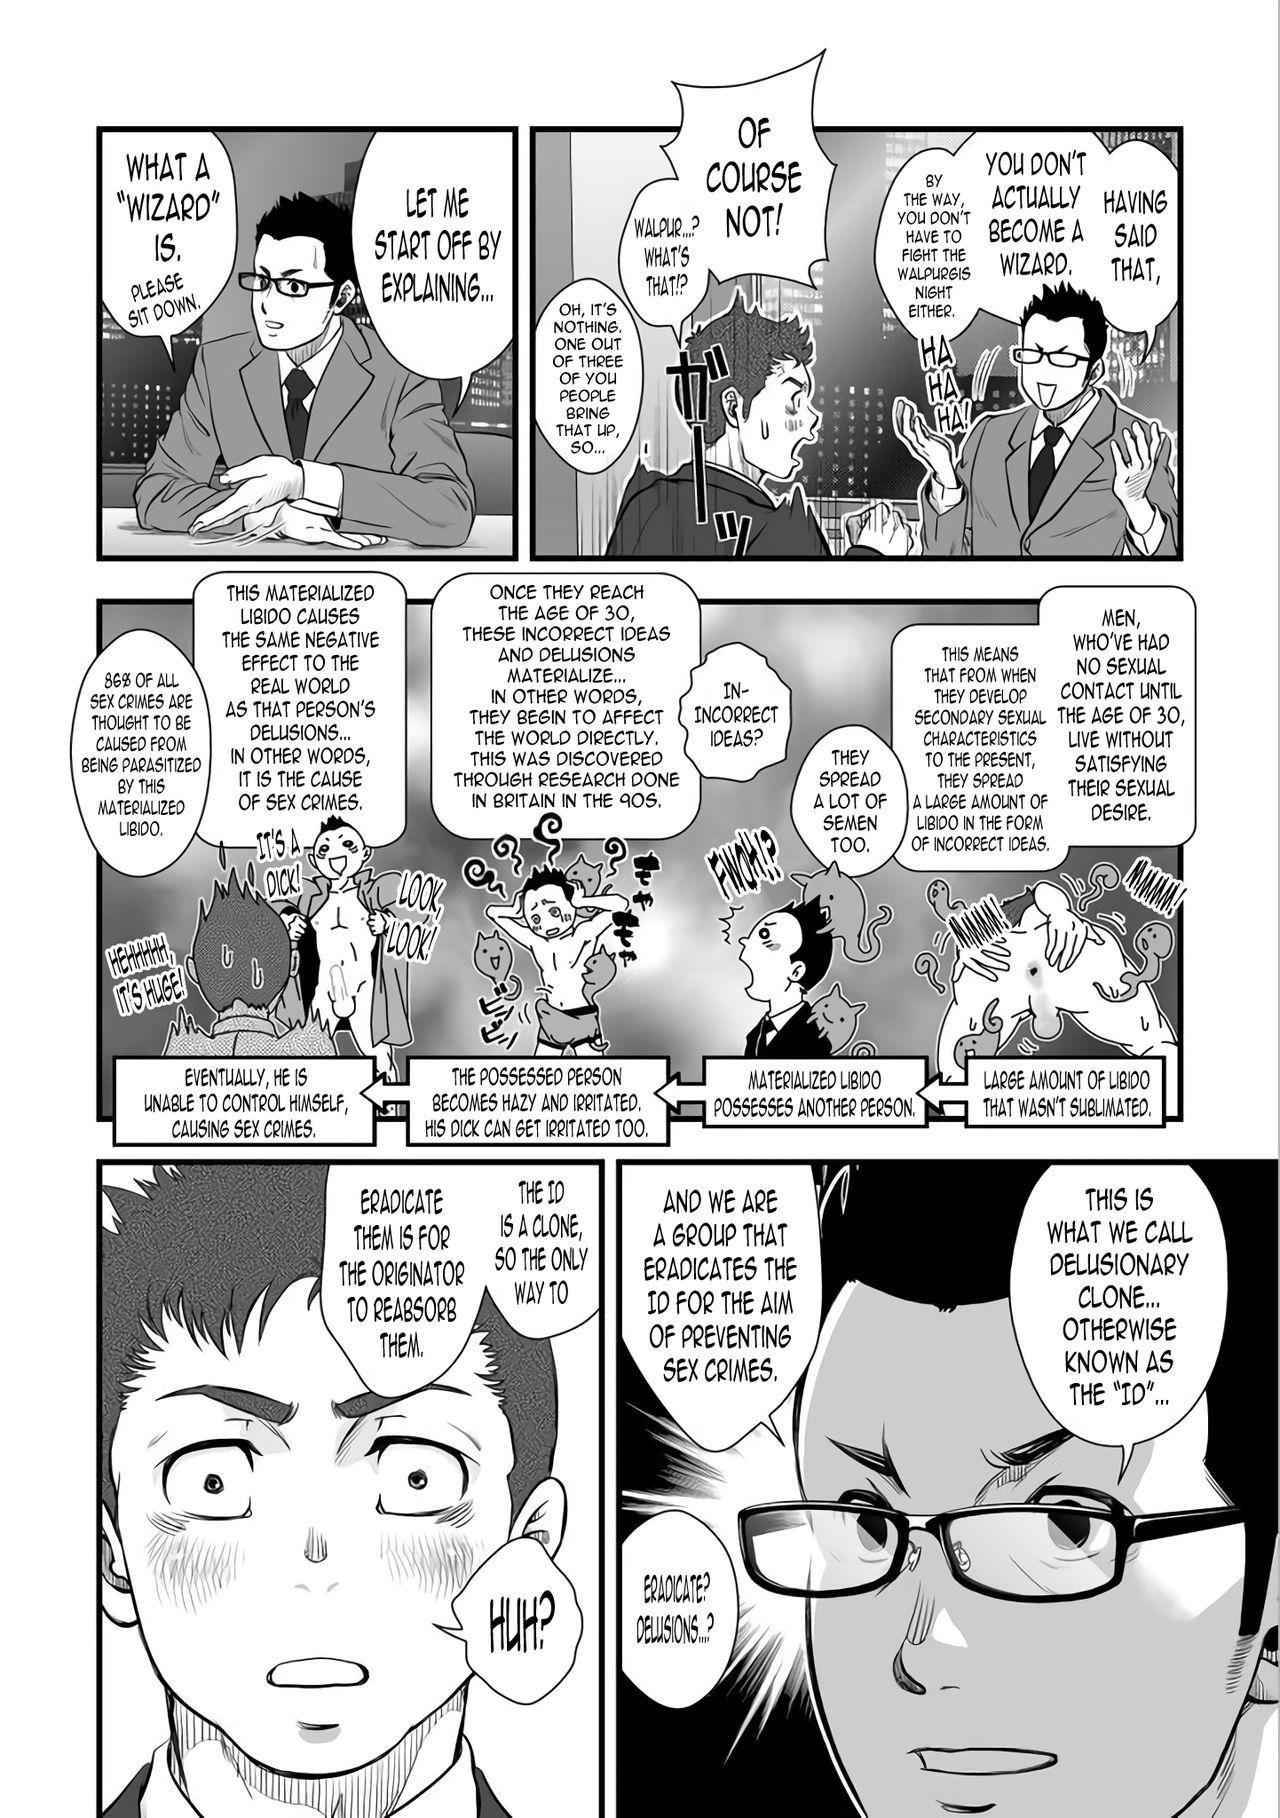 [Pagumiee (Kenta)] Tatakae!+++ (Plus-san)!! [English] [N04h] [Digital] 11